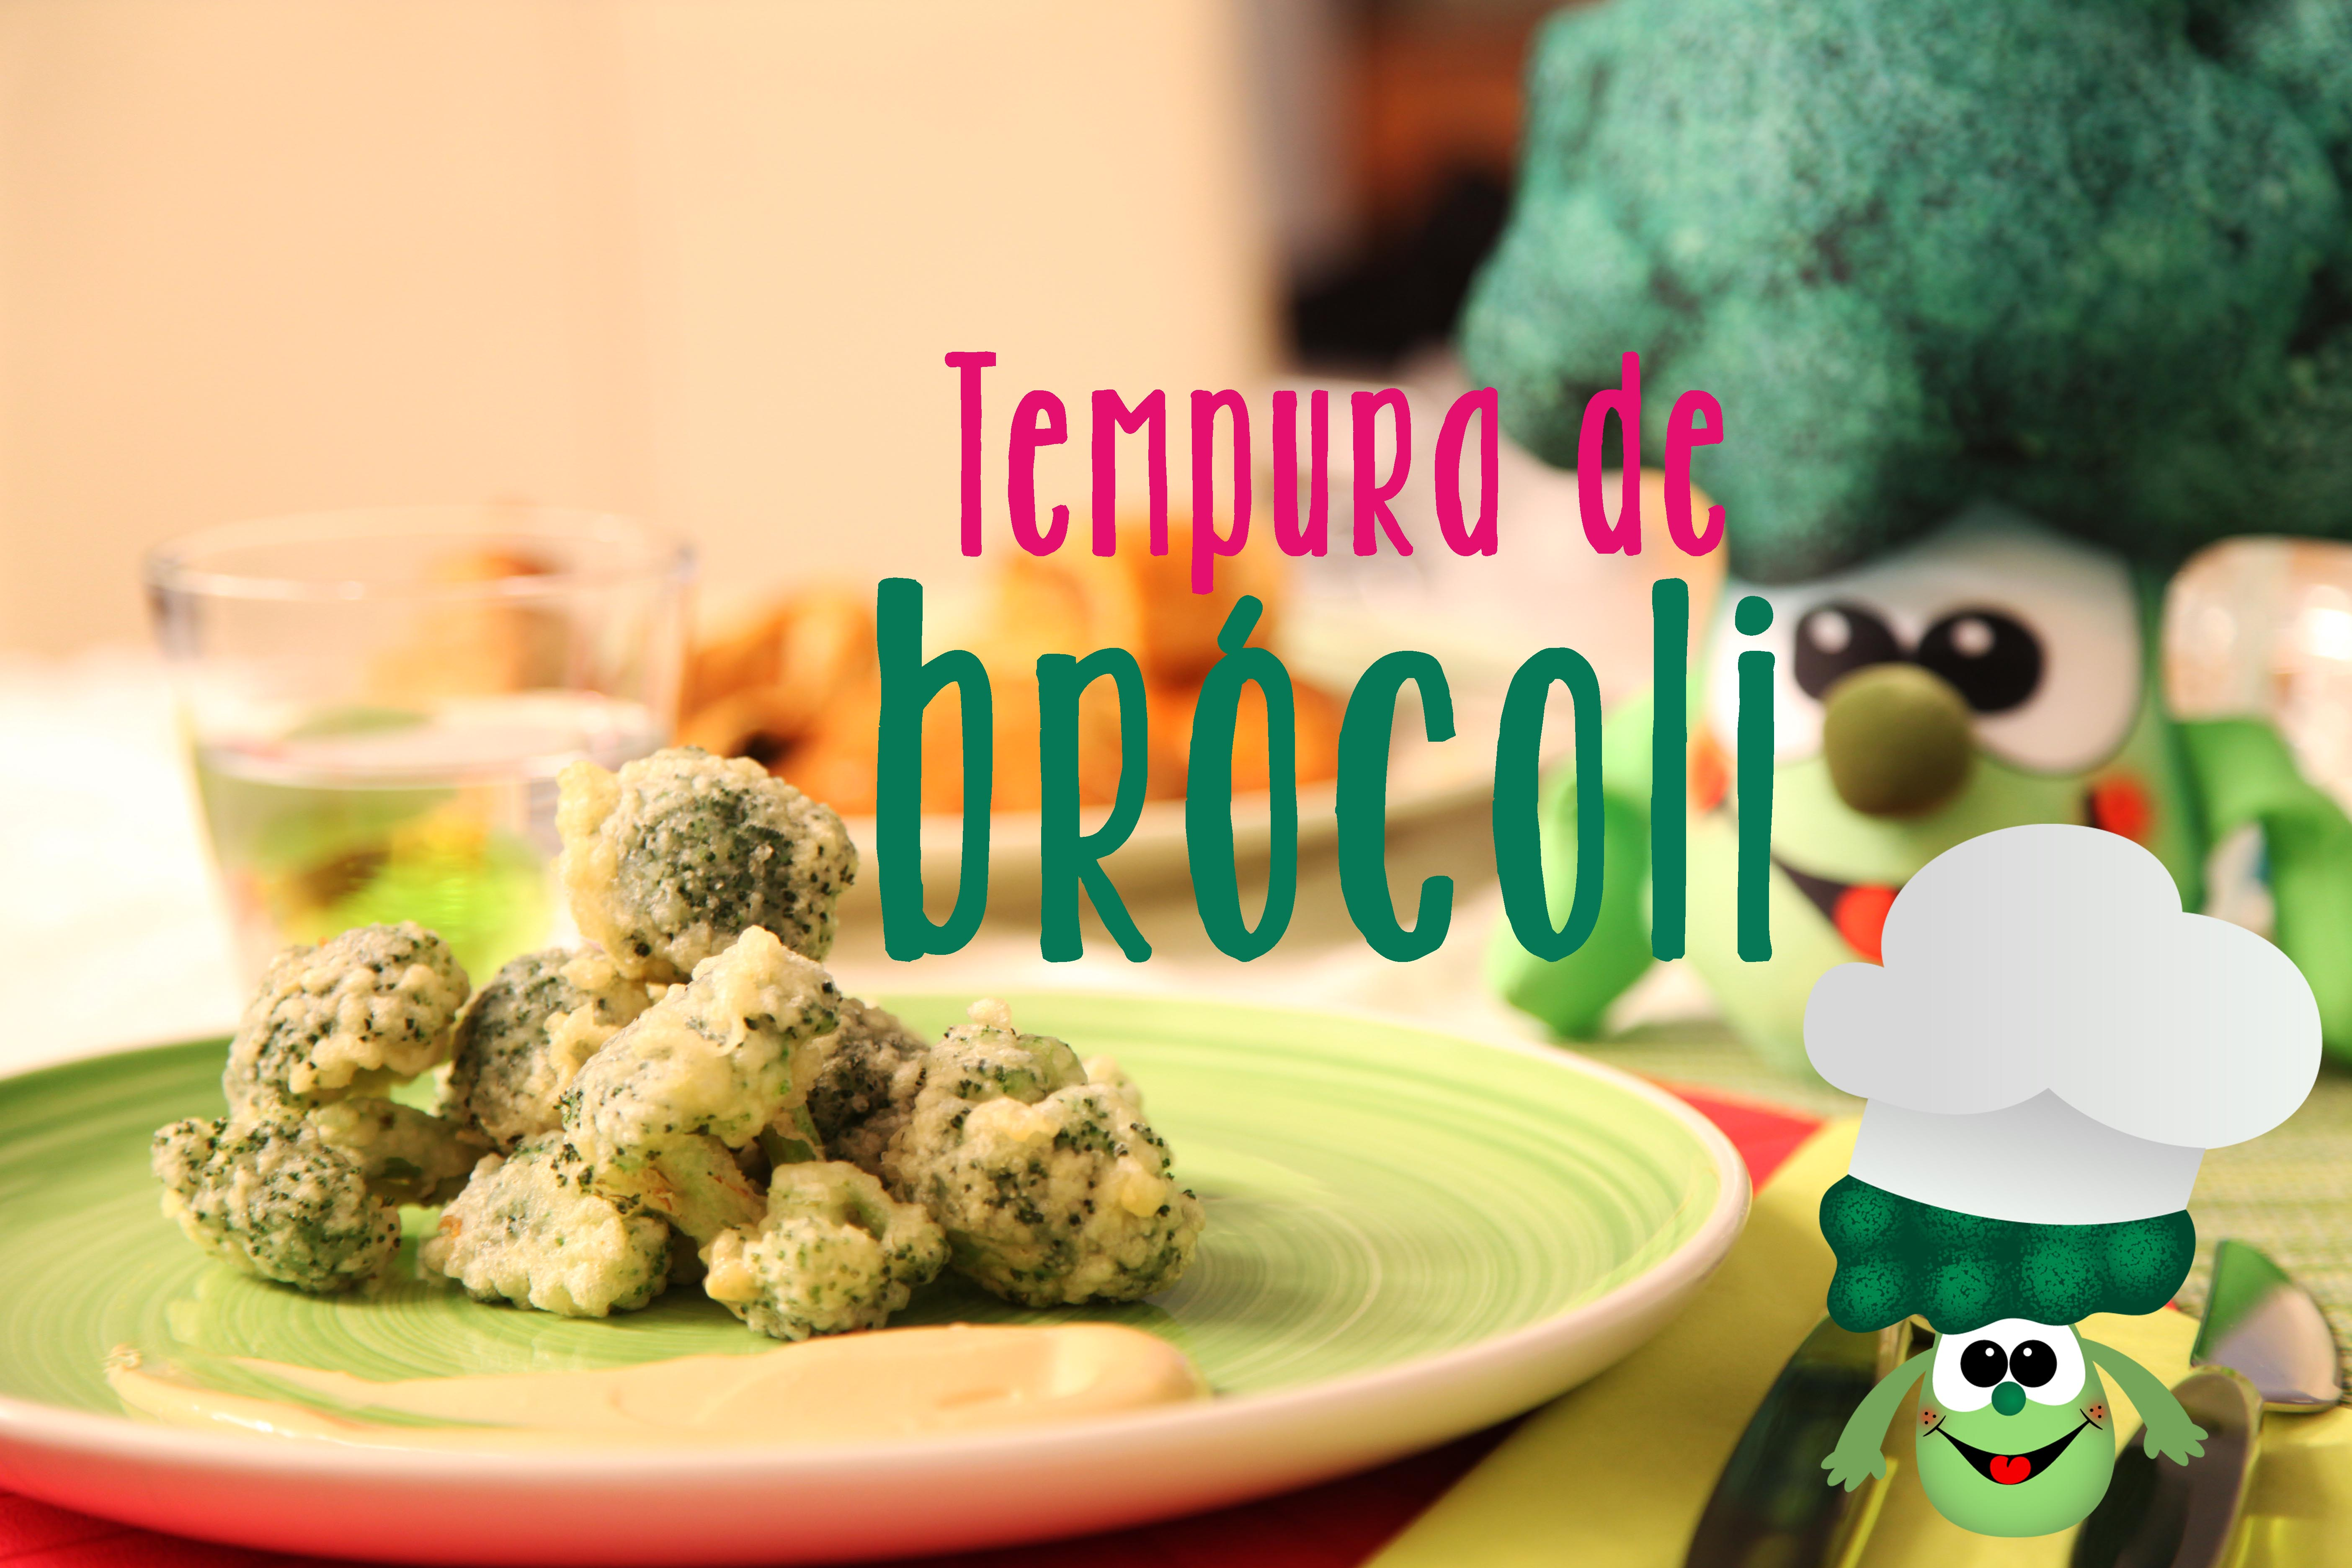 TEMPURA DE BRÓCOLI